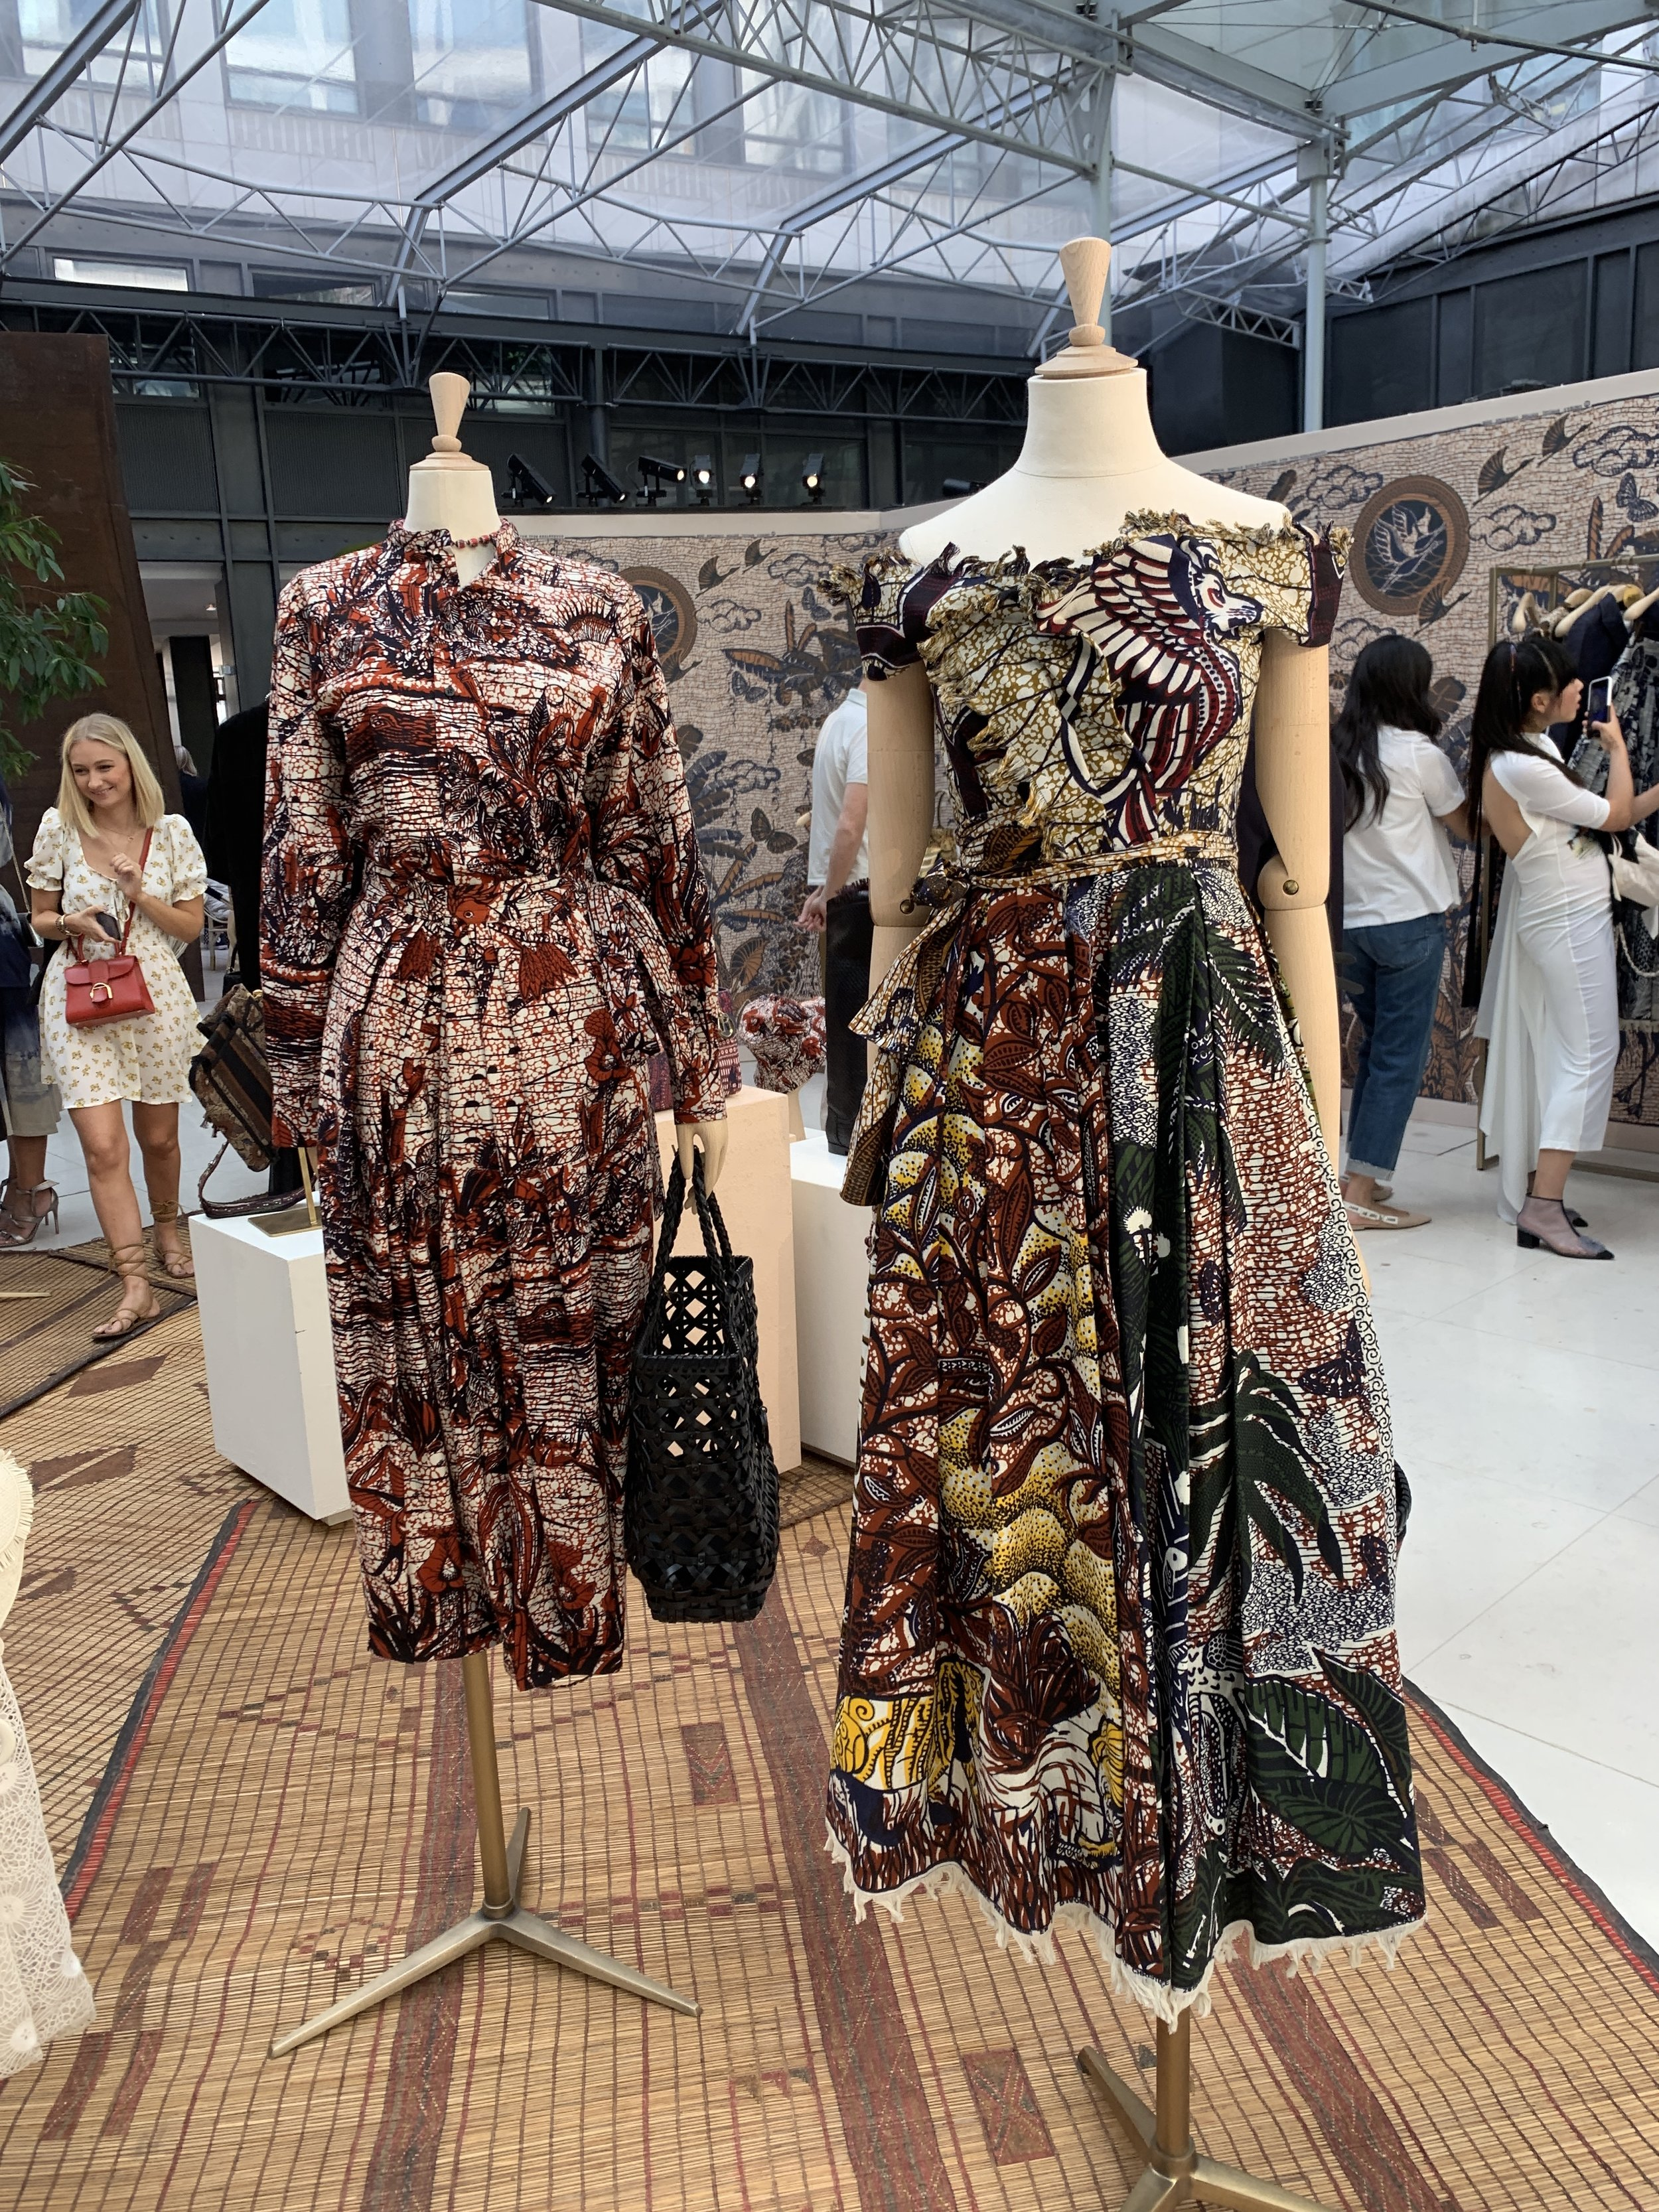 2/4 Christian Dior Resort 2020